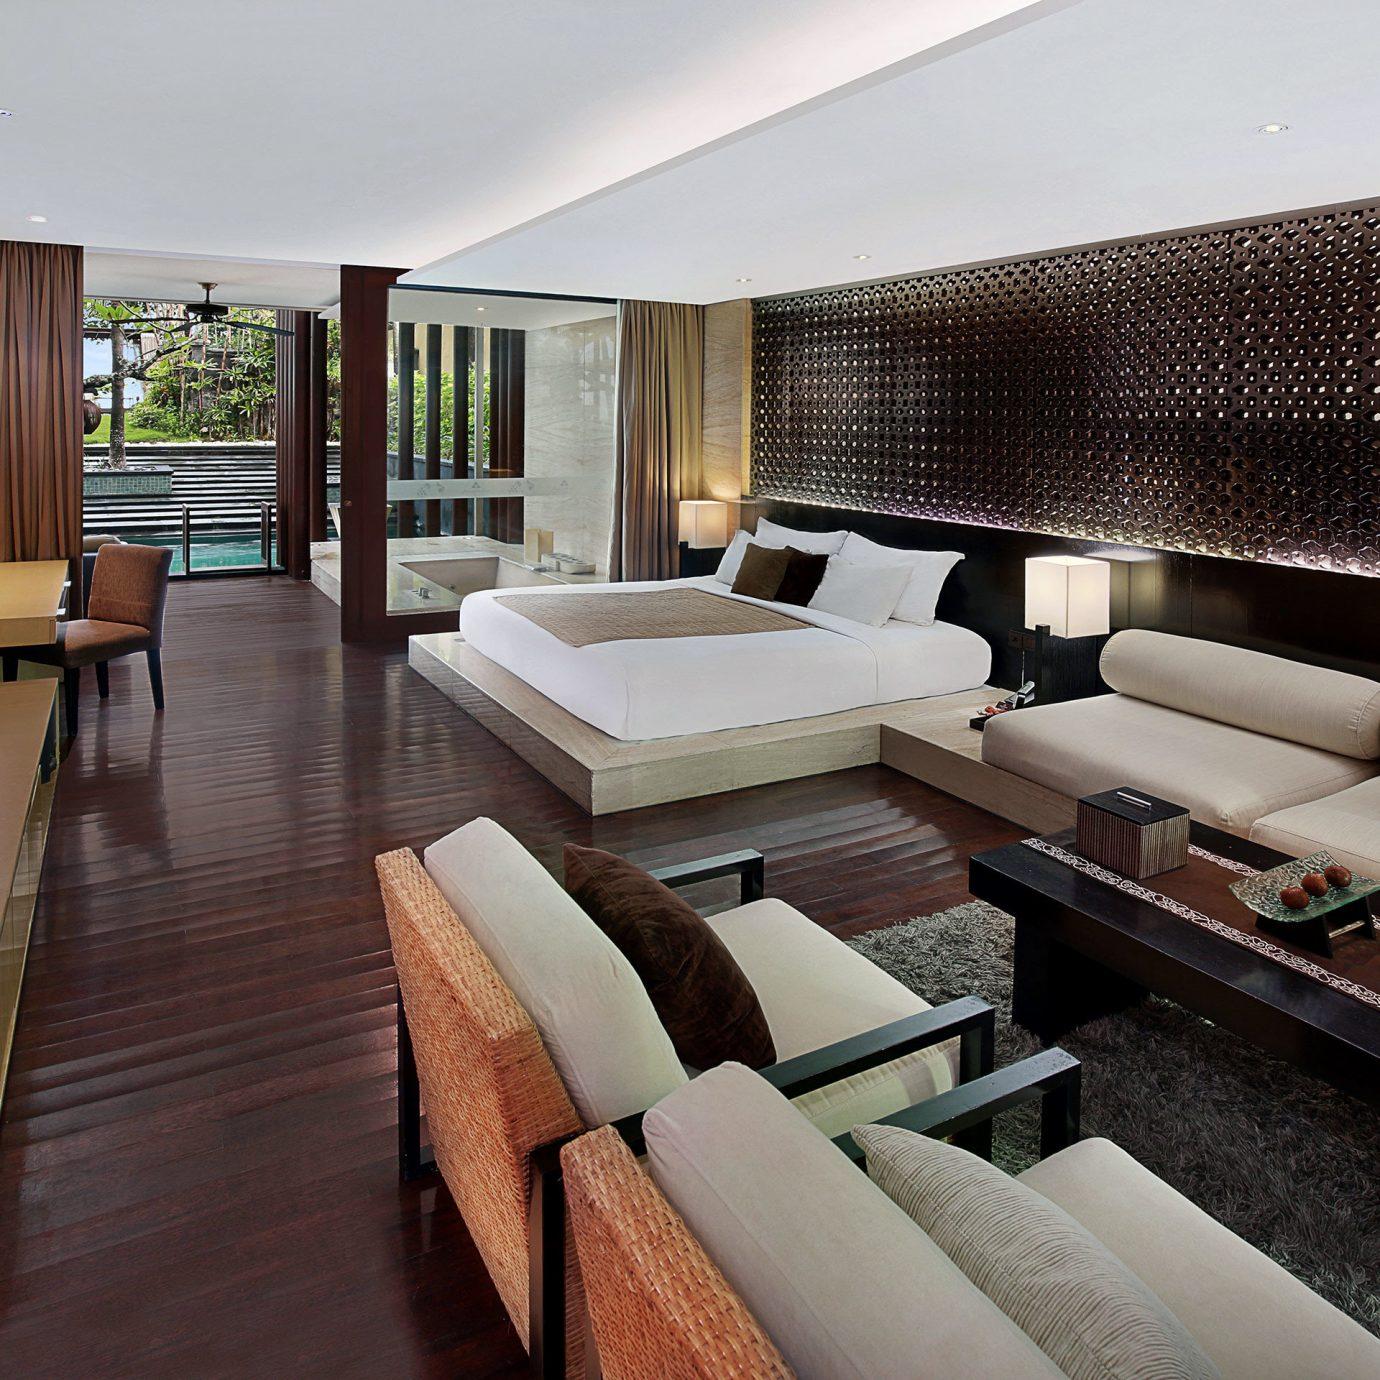 Beachfront Lounge Scenic views property Suite condominium living room Villa yacht Resort Modern